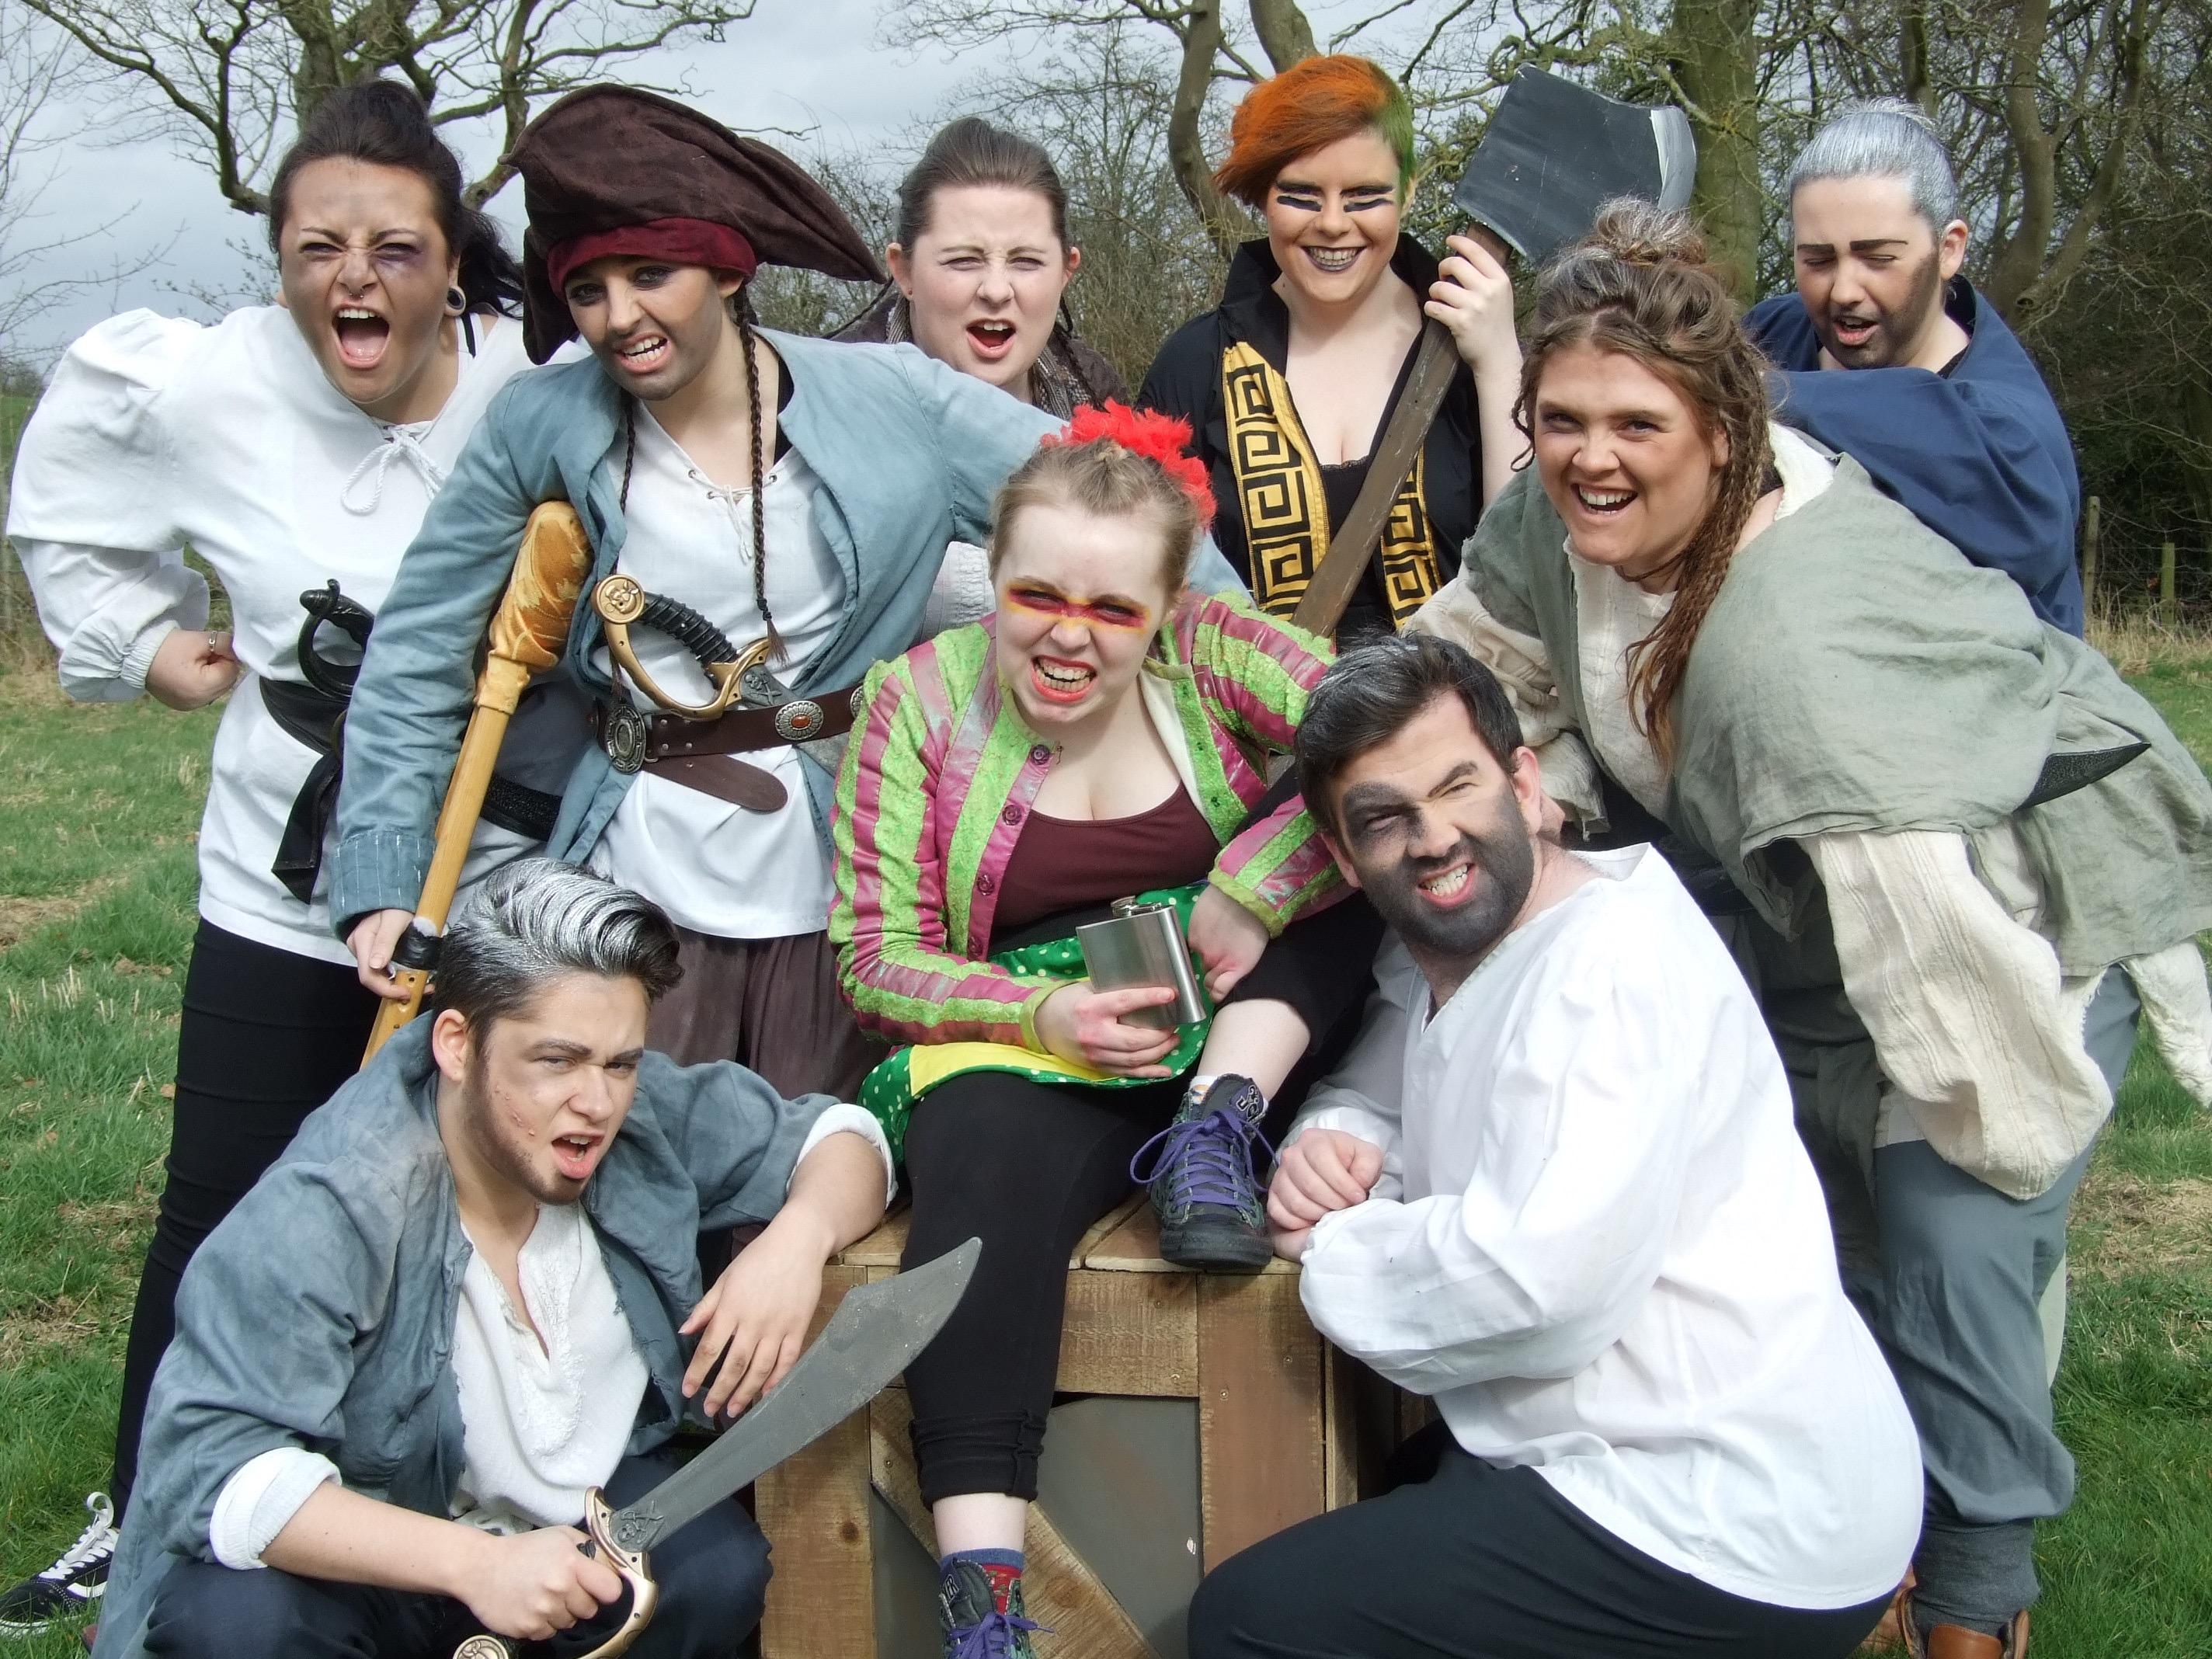 Long John Silver's Crew